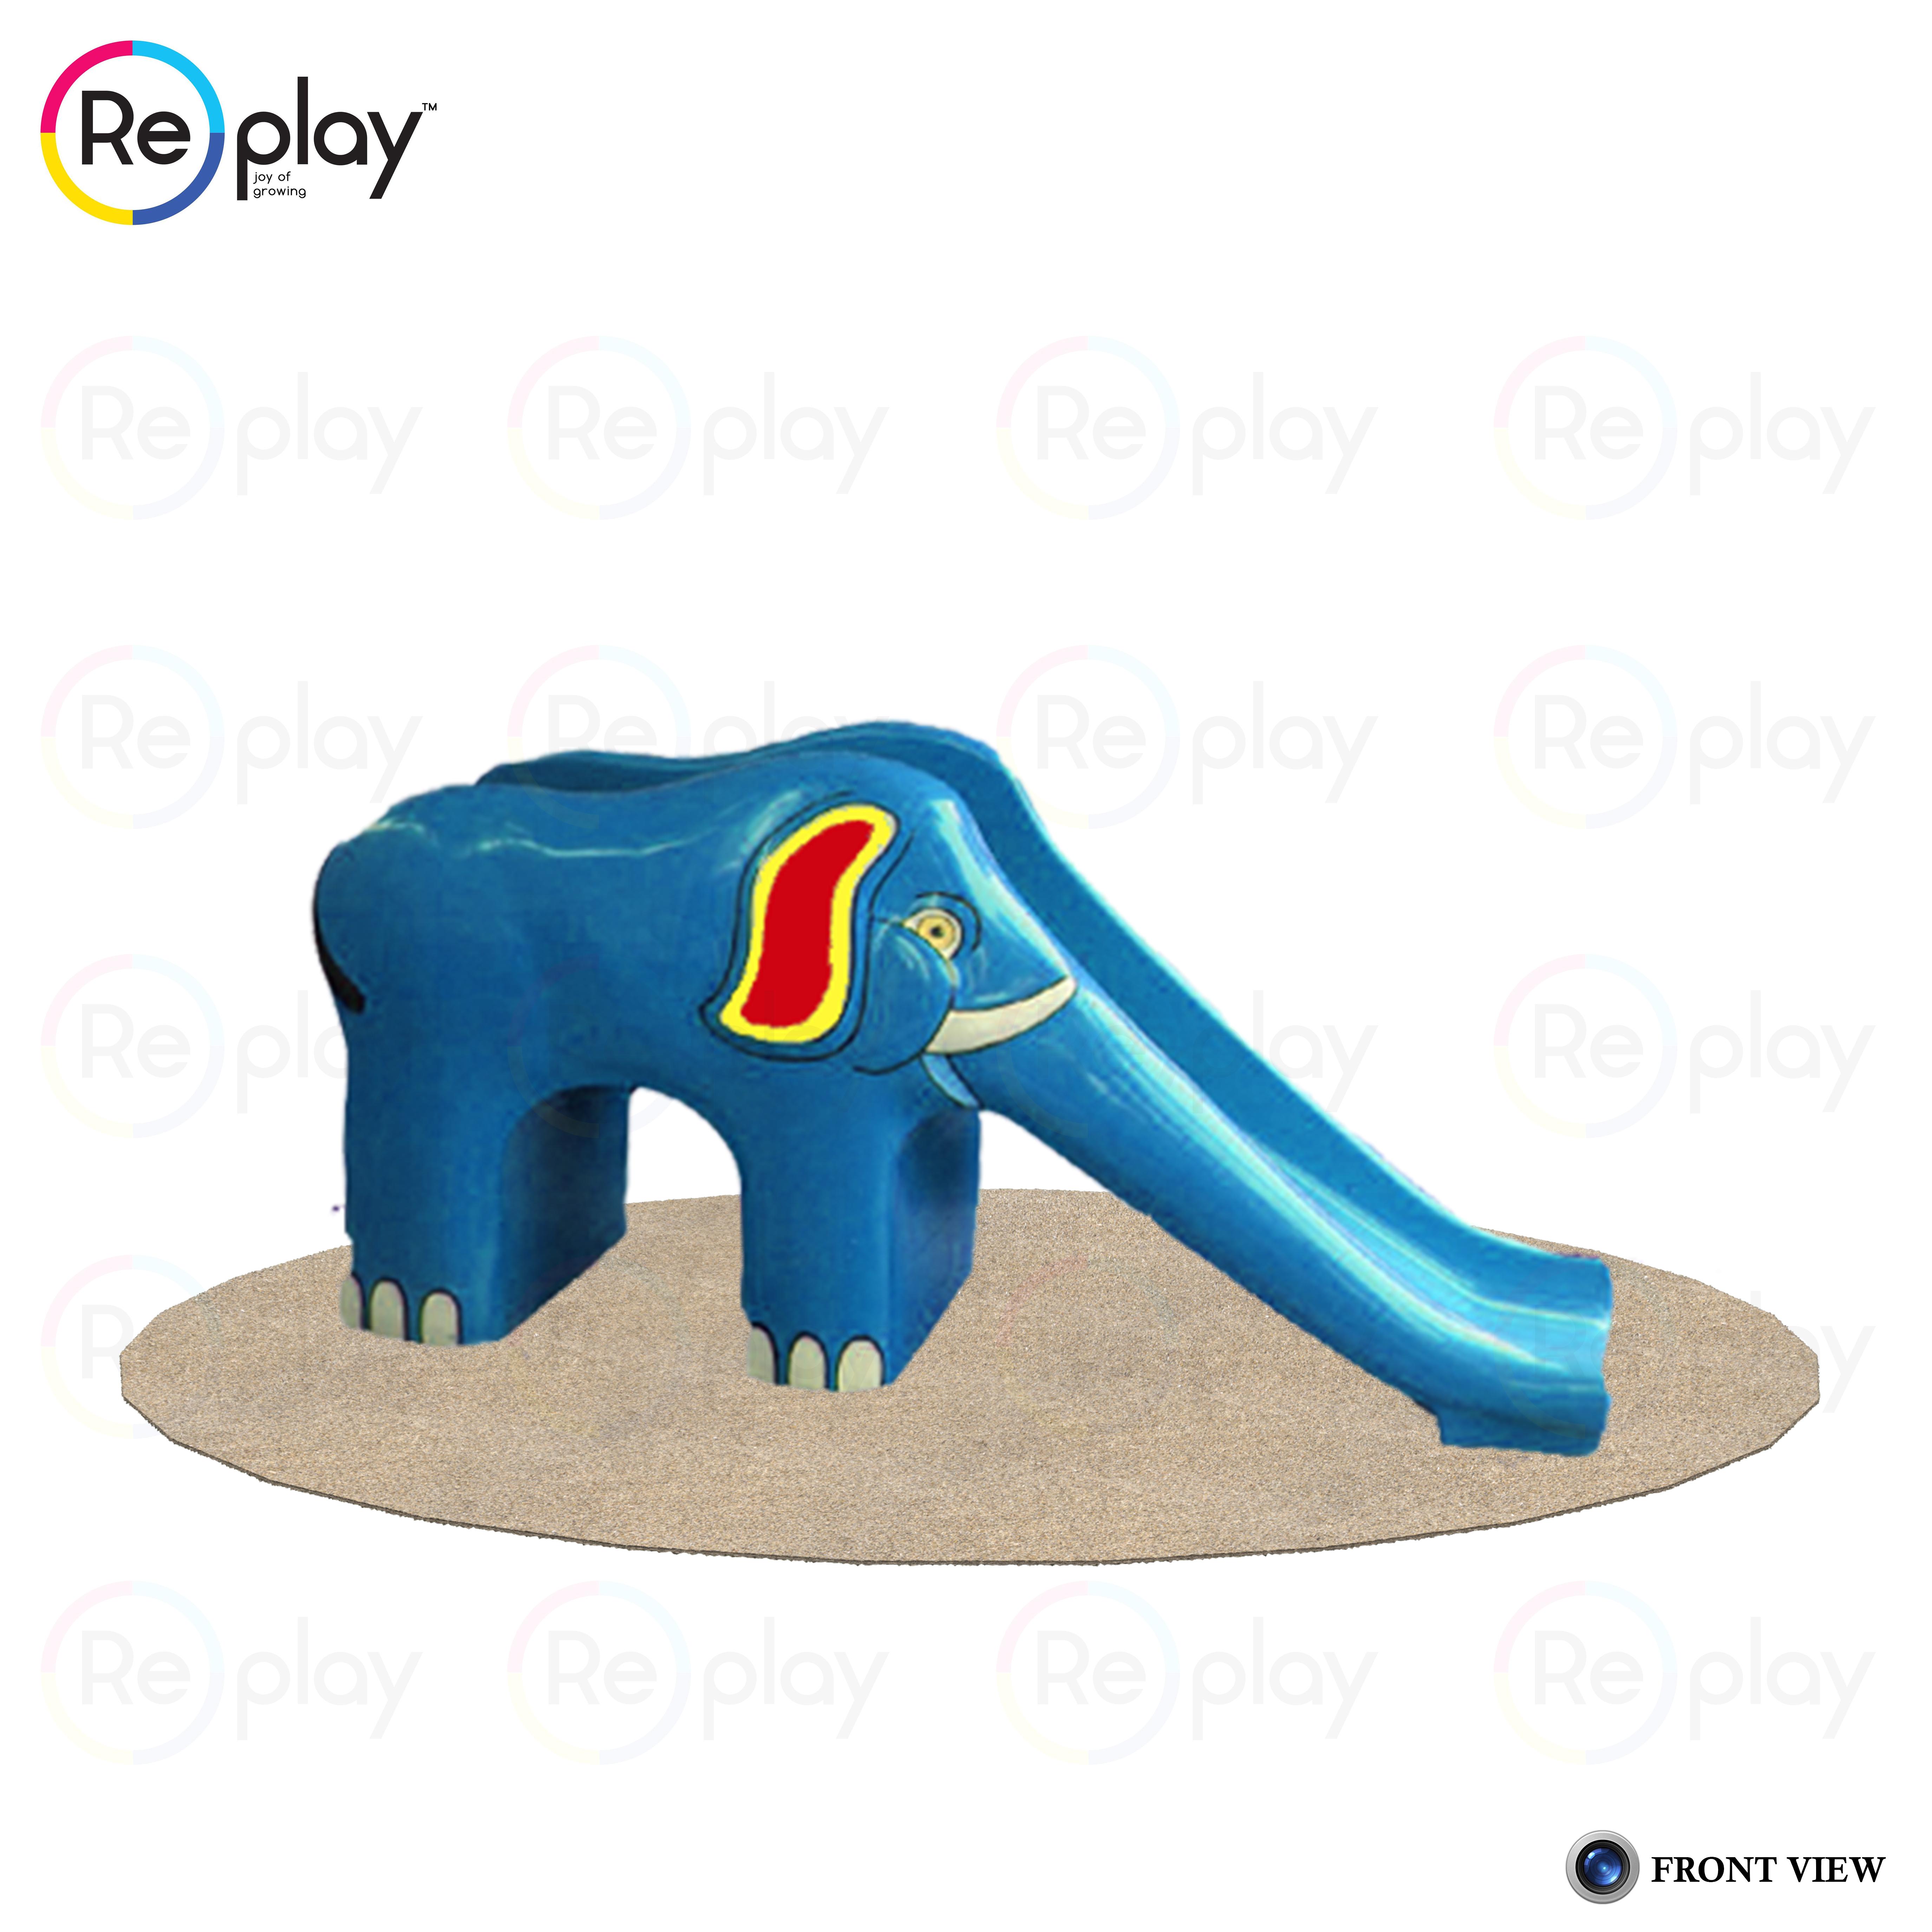 MINI ELEPHANT SLIDE